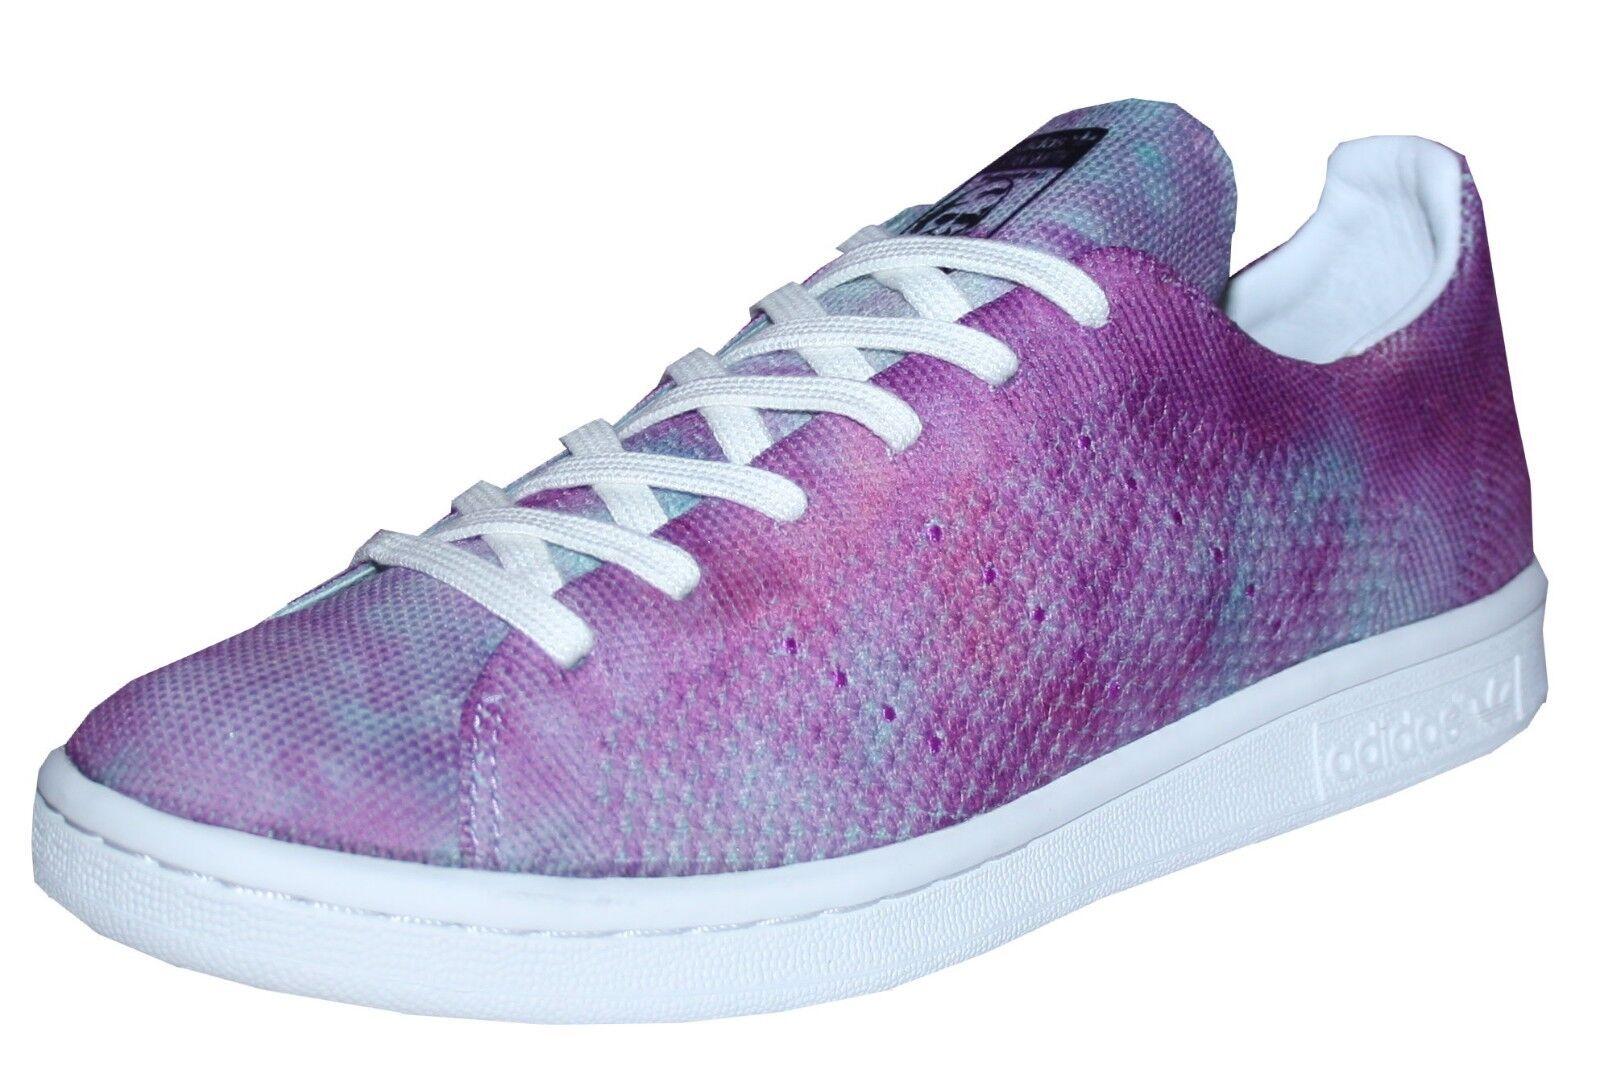 Adidas PW HU Holi Stan Smith MC Pharrell Williams Textil Sneaker Damen/Herren